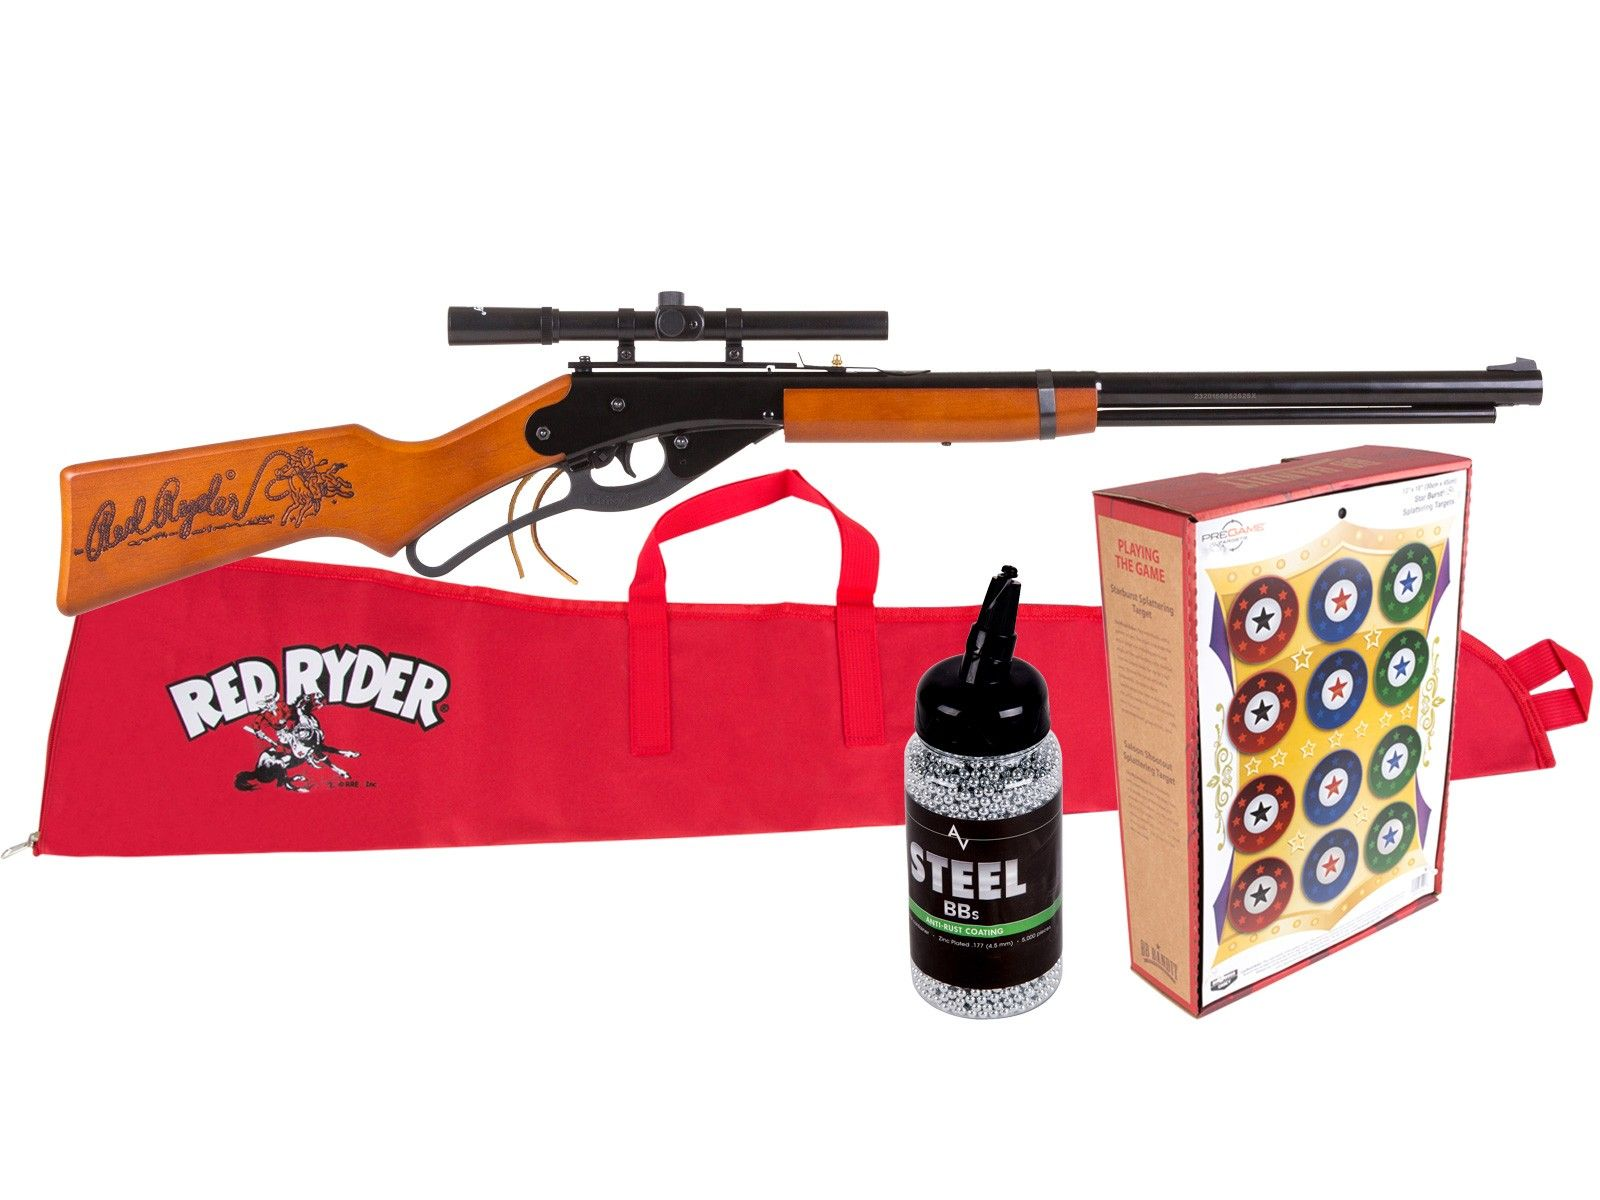 Daisy Red Ryder Lasso Scoped BB Rifle Kit  Air rifles - PyramydAir